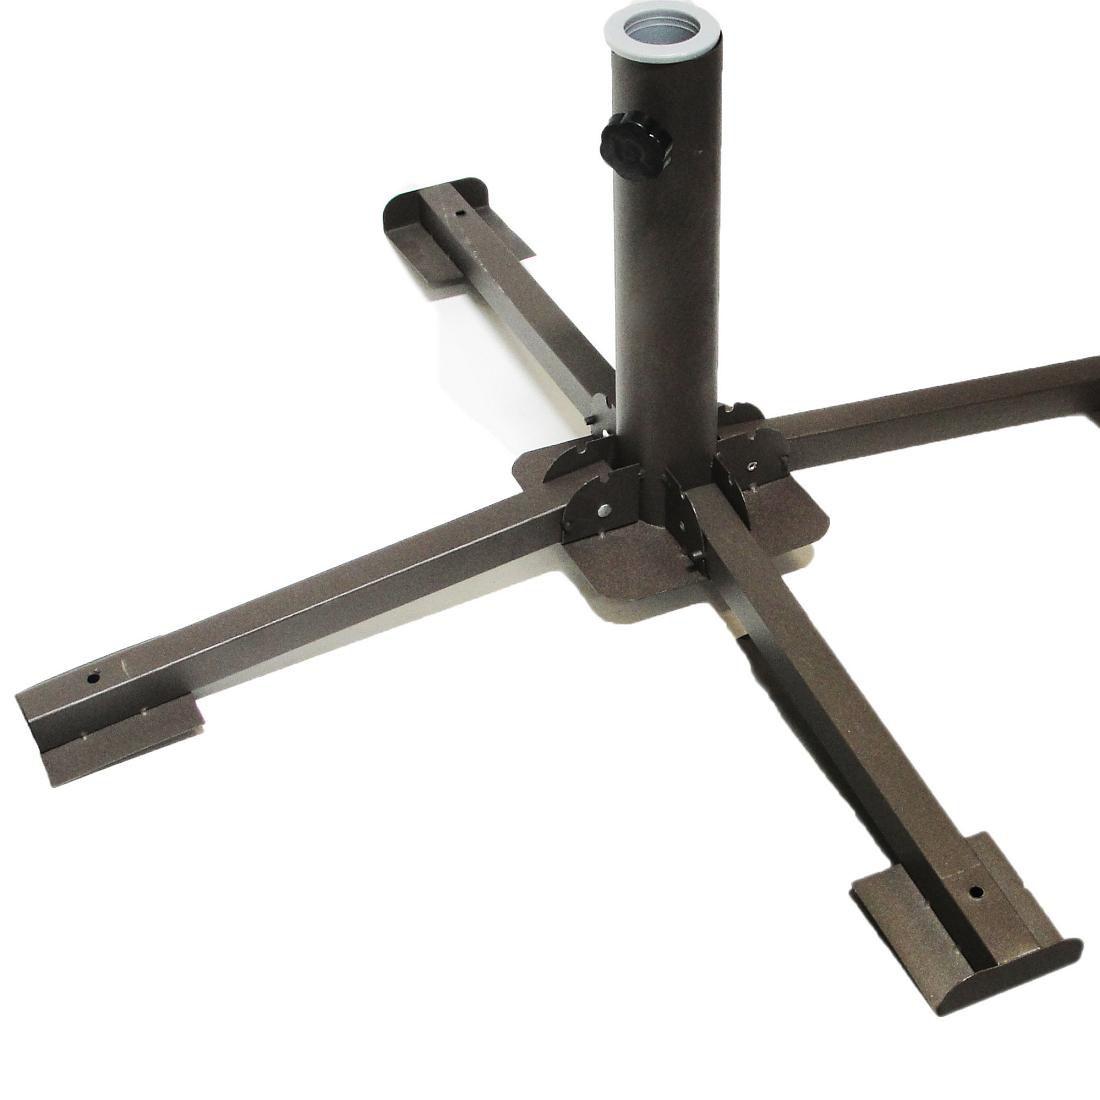 Kit 2 Base Metal Dobrável Guarda Sol Ombrelone 38 a 54mm Mor